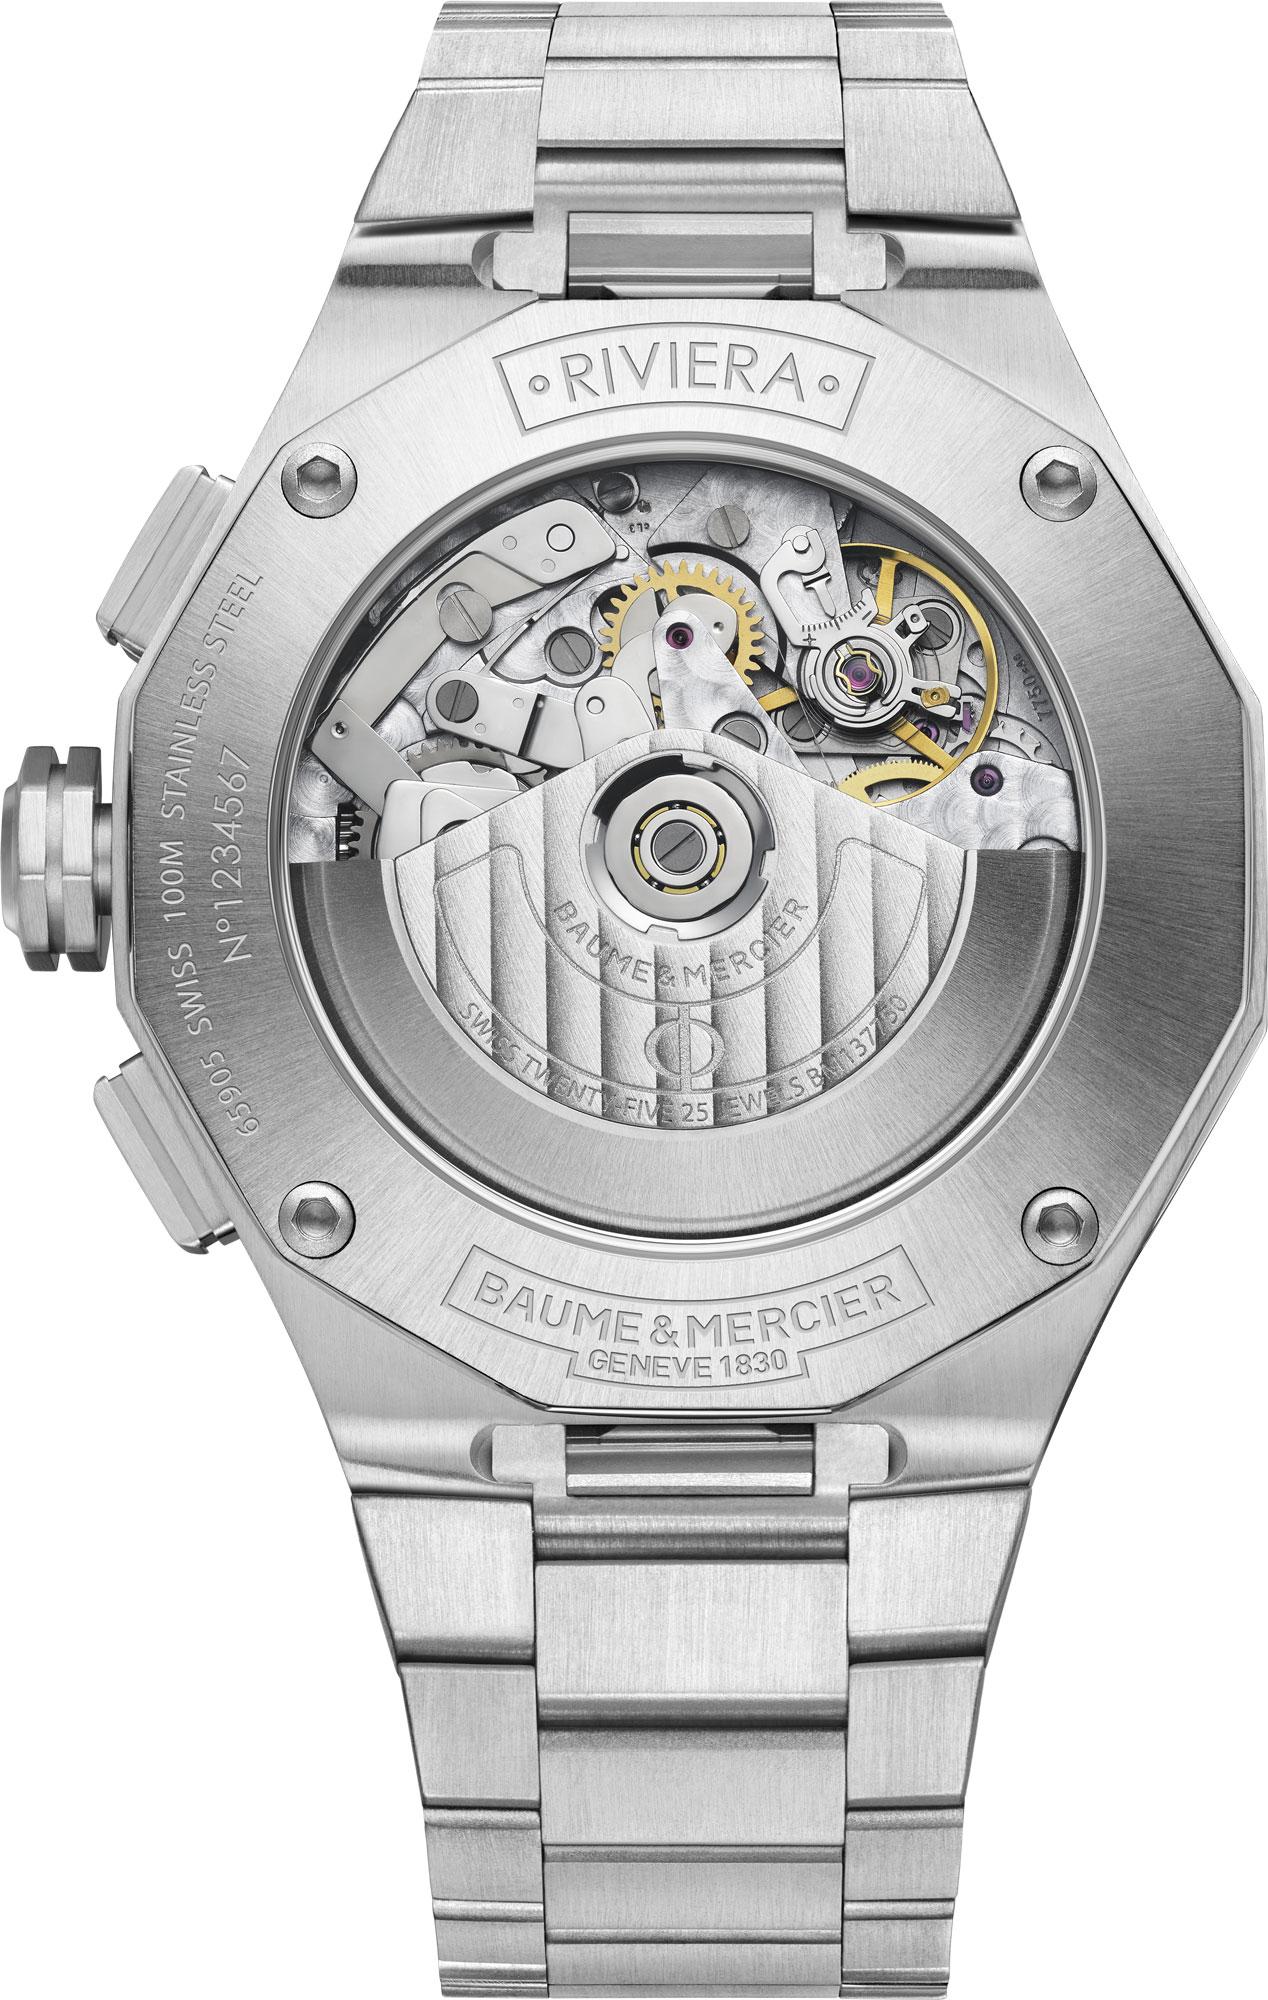 Baume & Mercier cronografo Riviera - Ref. M0A10624